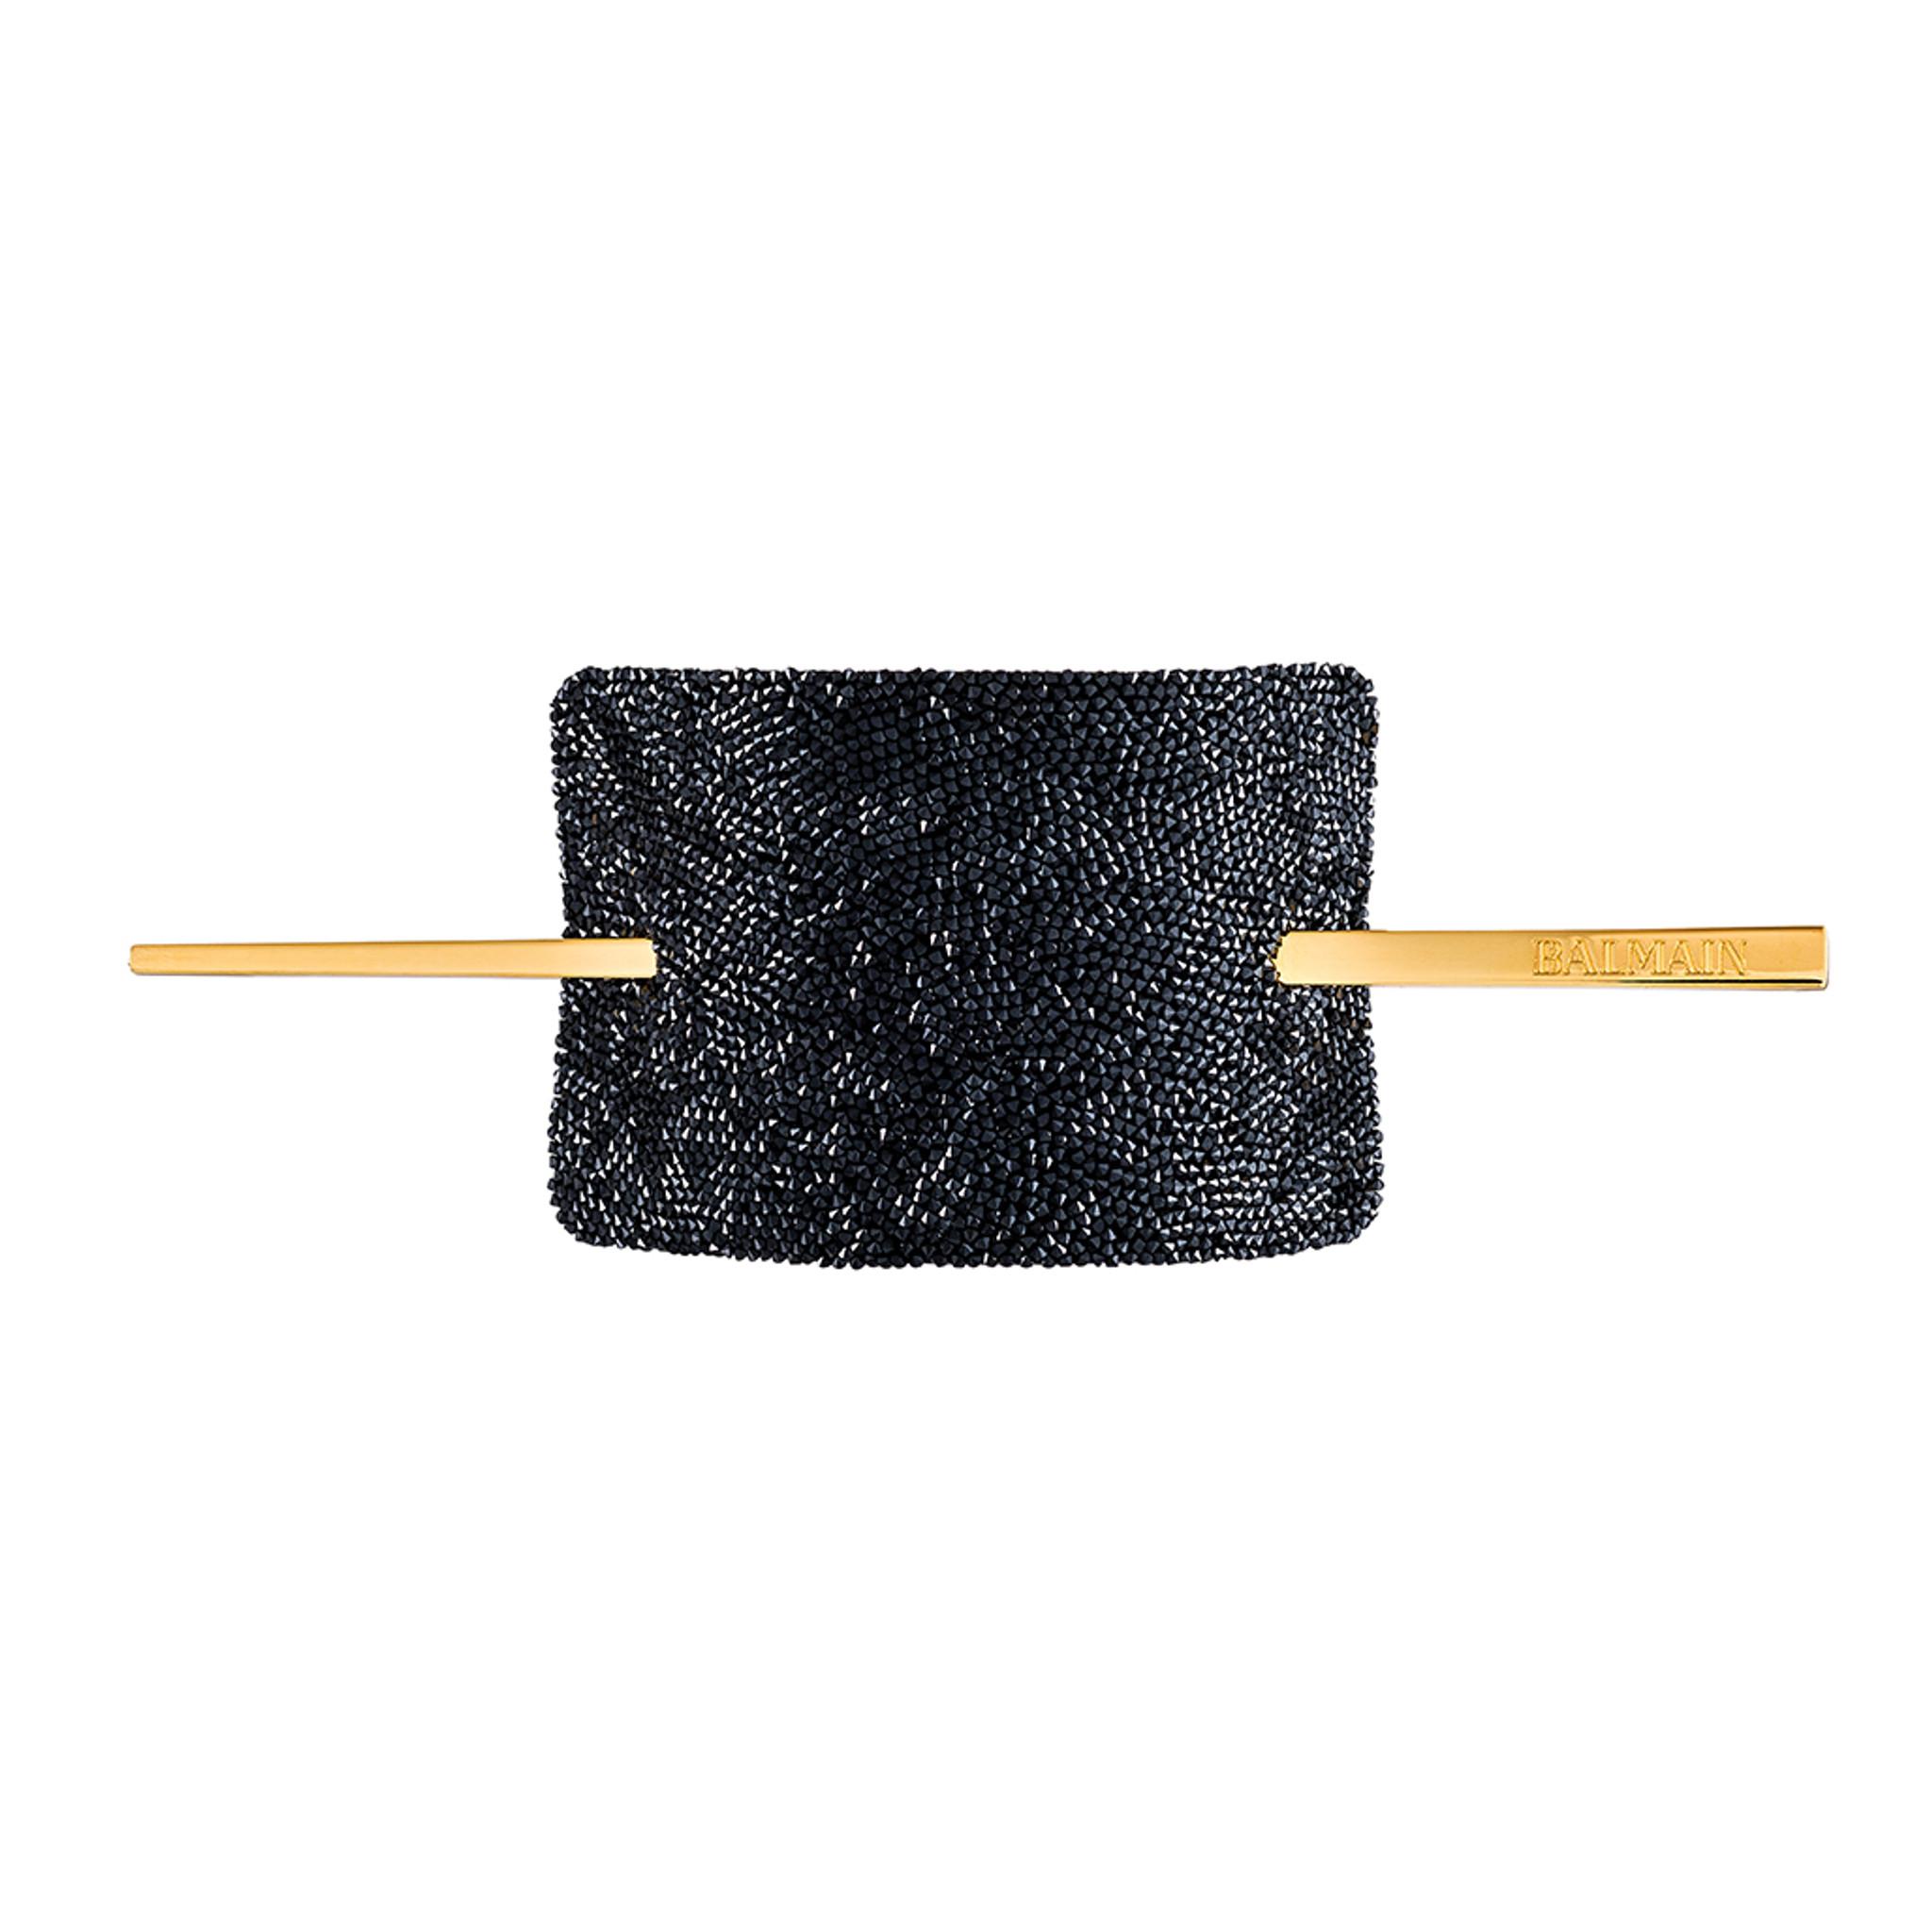 LUXURY HAIR BARRETTE CRYSTAL BLACK (Limited Edition) by Balmain Paris Hair Couture